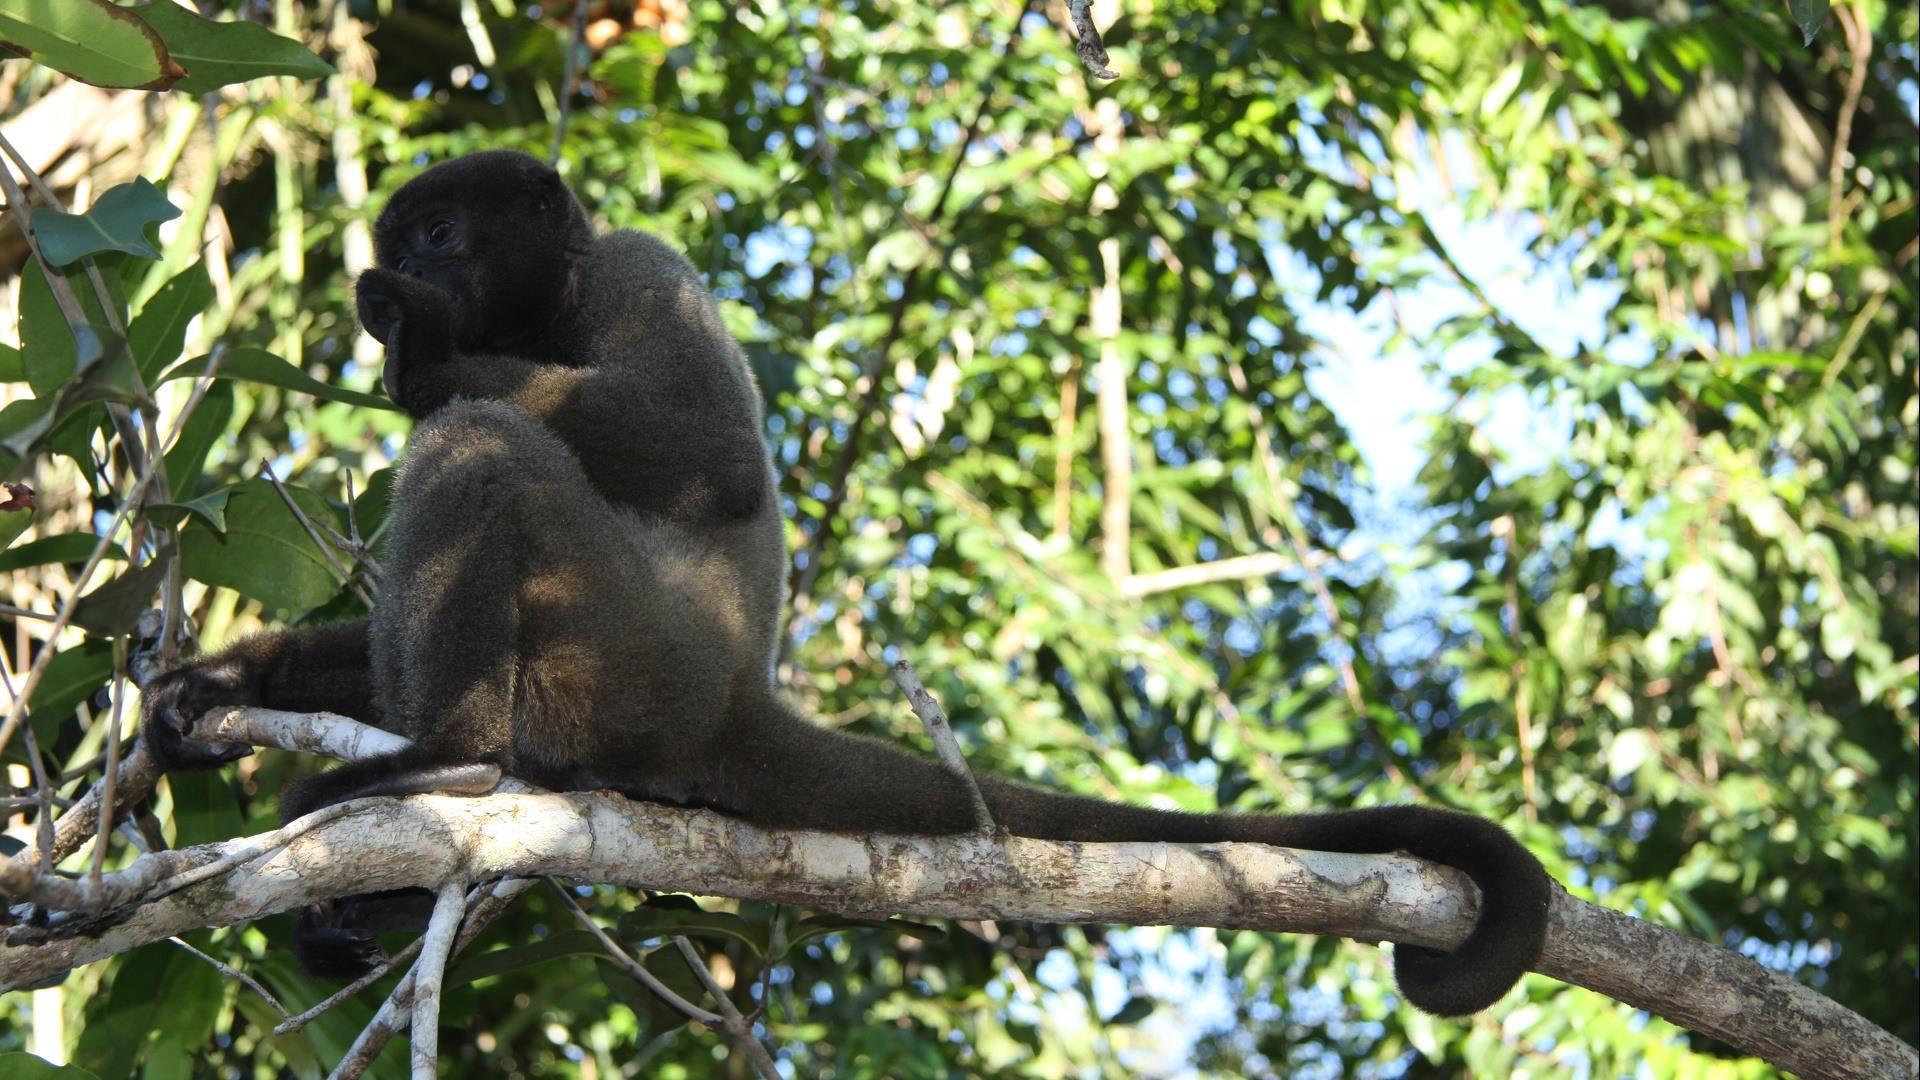 Brasilien Amazonas: 6 Tage Reisebaustein - Juma Amazon Lodge Uirapuru Paket